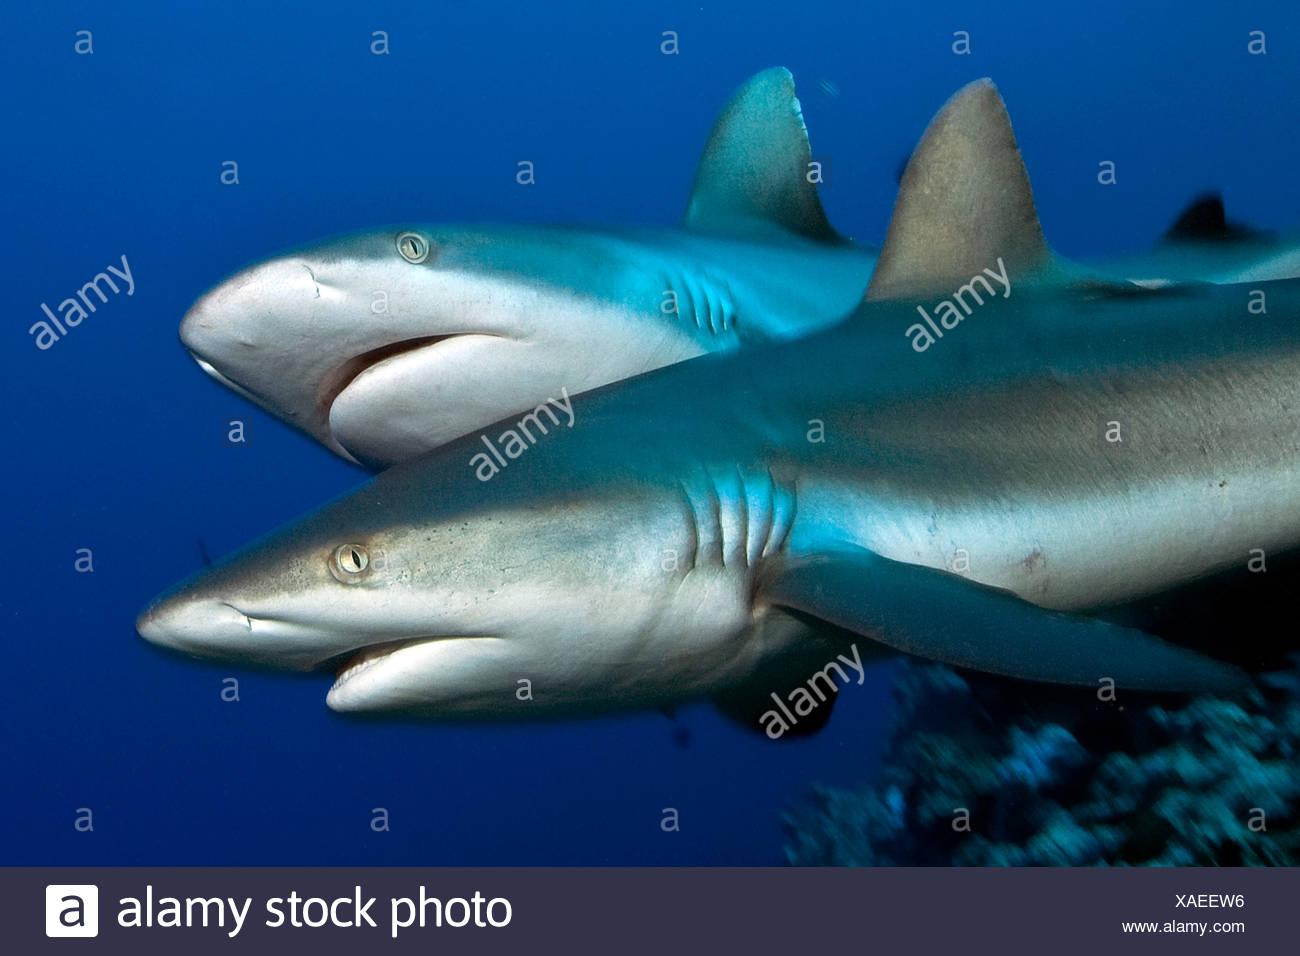 longnose blacktail shark stock photos longnose blacktail shark